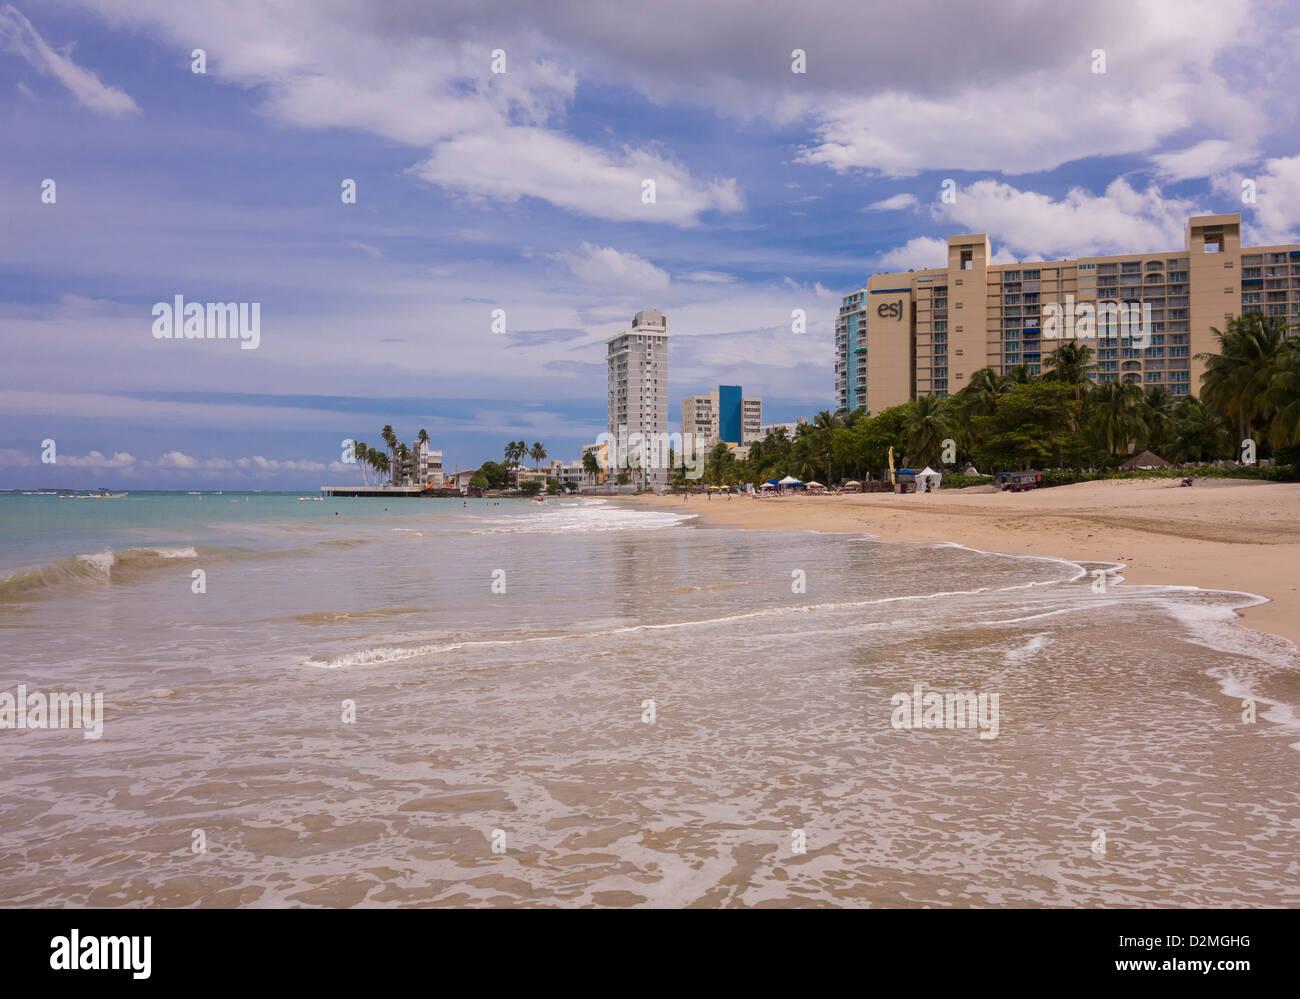 SAN JUAN, PUERTO RICO - Touristen am Strand von Isla Verde. Stockfoto